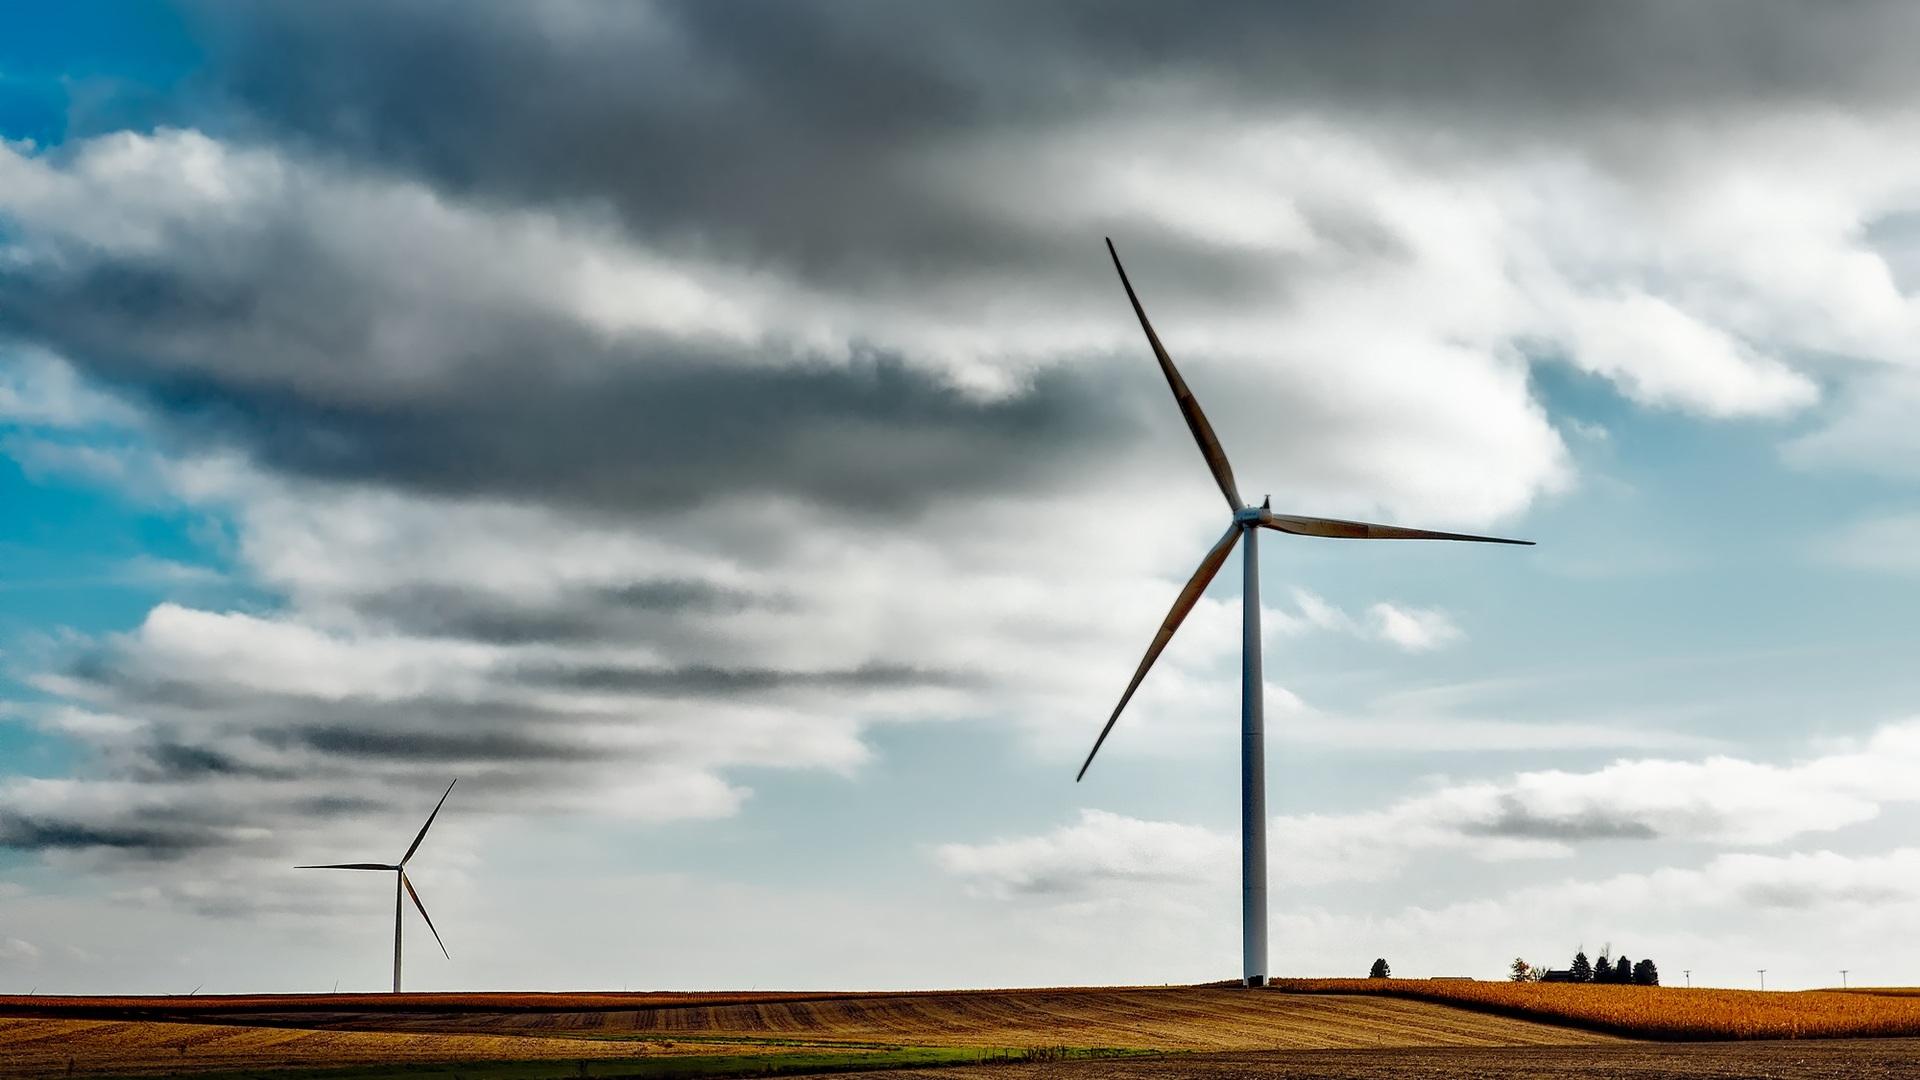 windfarm-jf.jpg